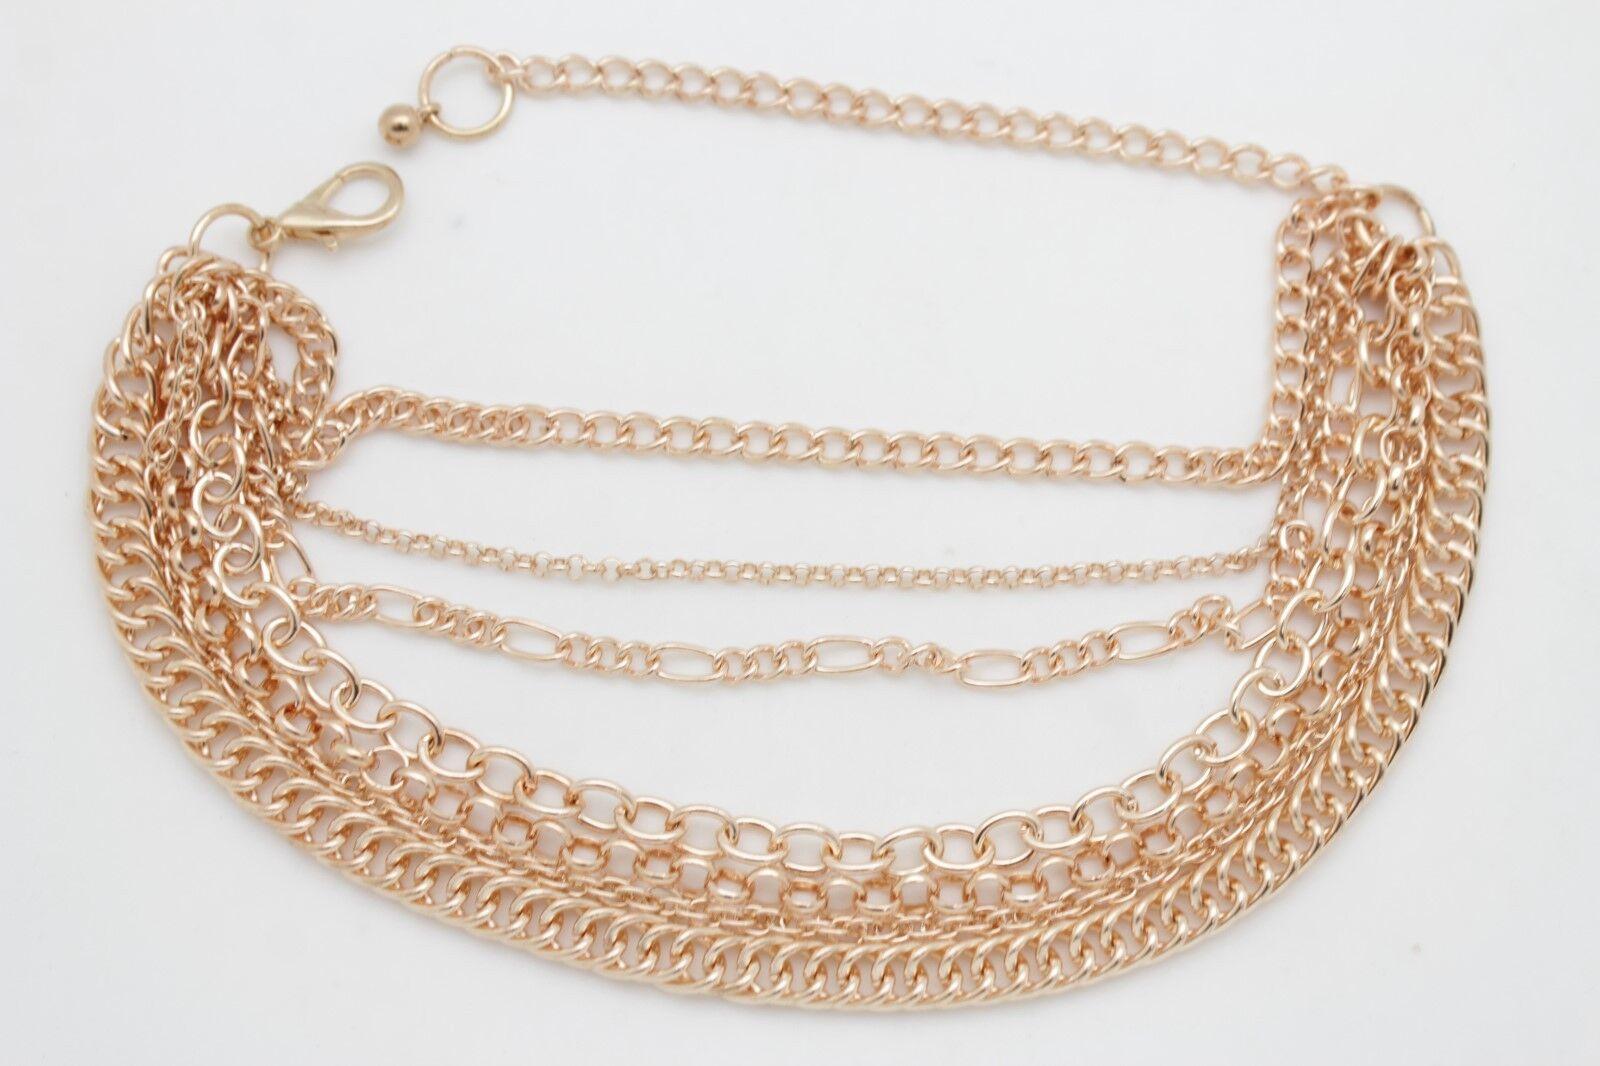 Sexy Women Fancy Jewelry Boot Bracelet Gold Metal Chain Anklet Dressy Shoe Charm